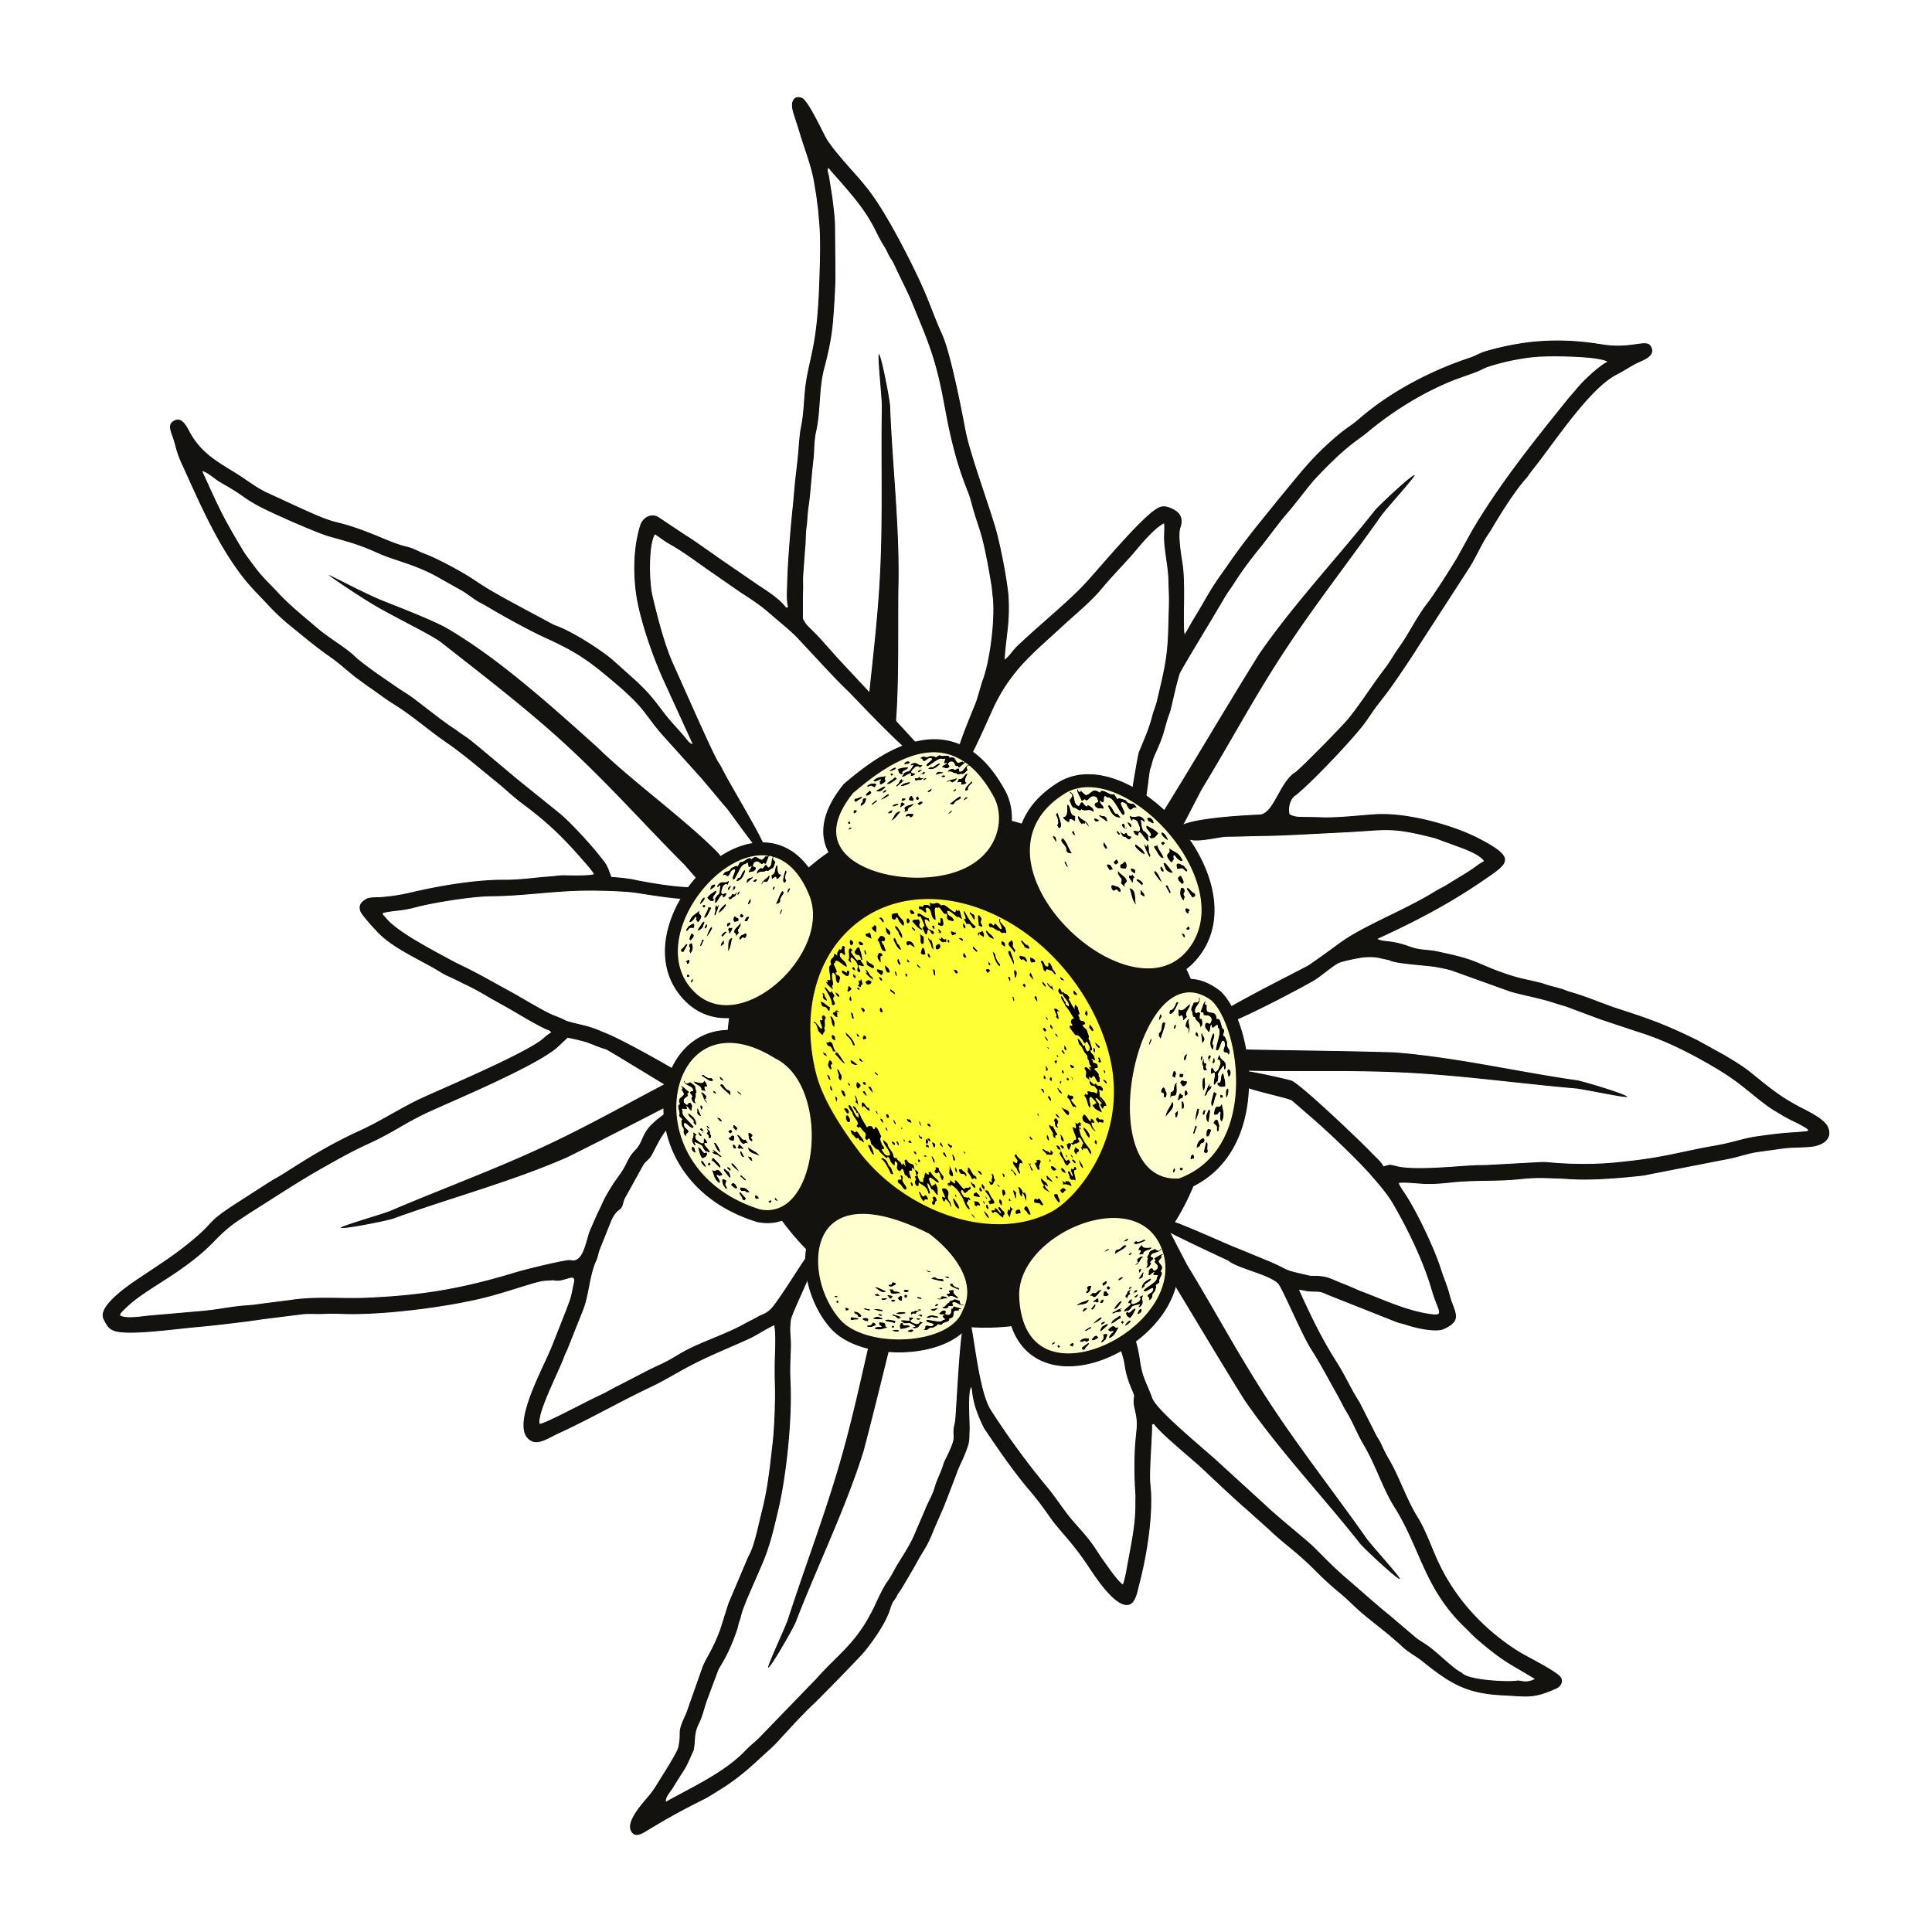 Sticker edelweiss 90 x 90 mm – Bild 1